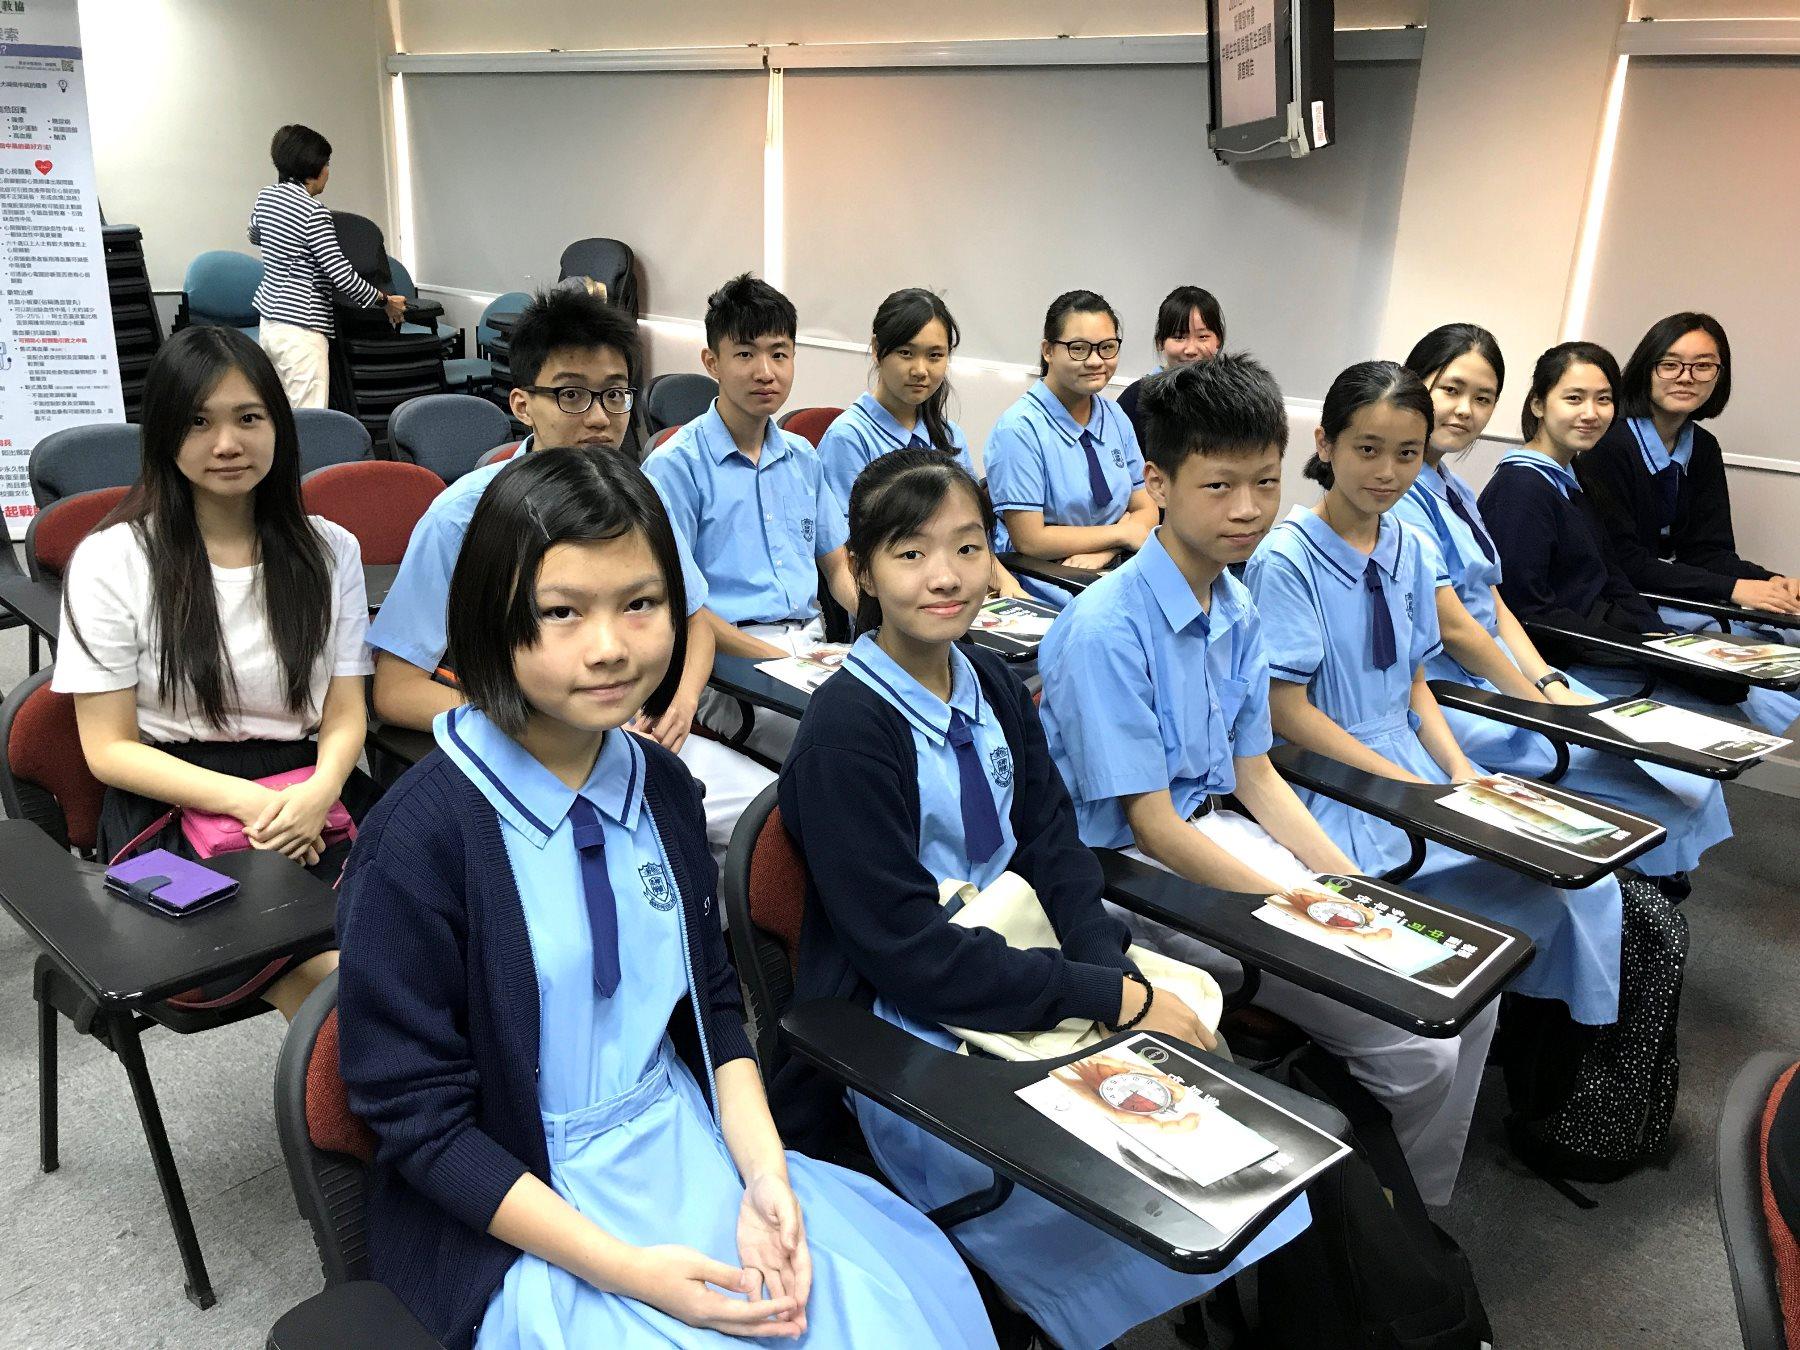 http://npc.edu.hk/sites/default/files/01_1.jpg